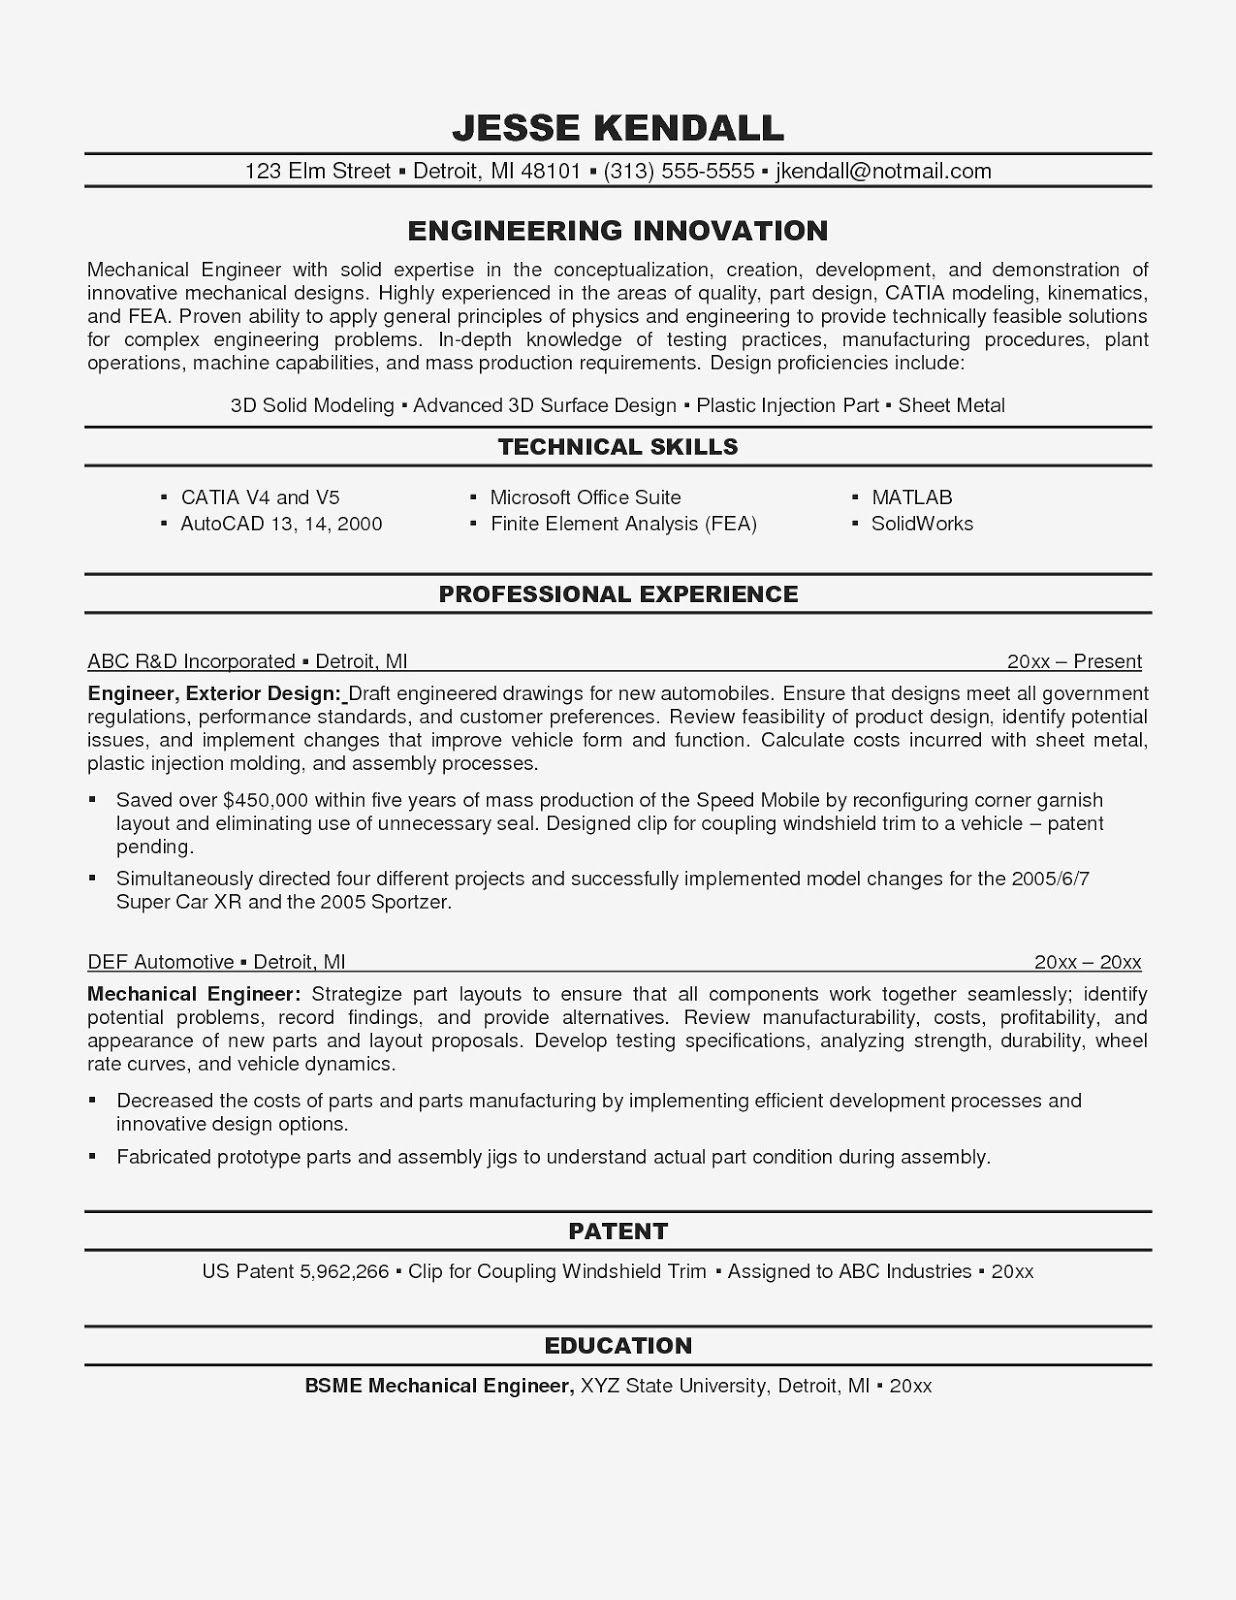 Mechanical Engineering CV Format, mechanical engineering